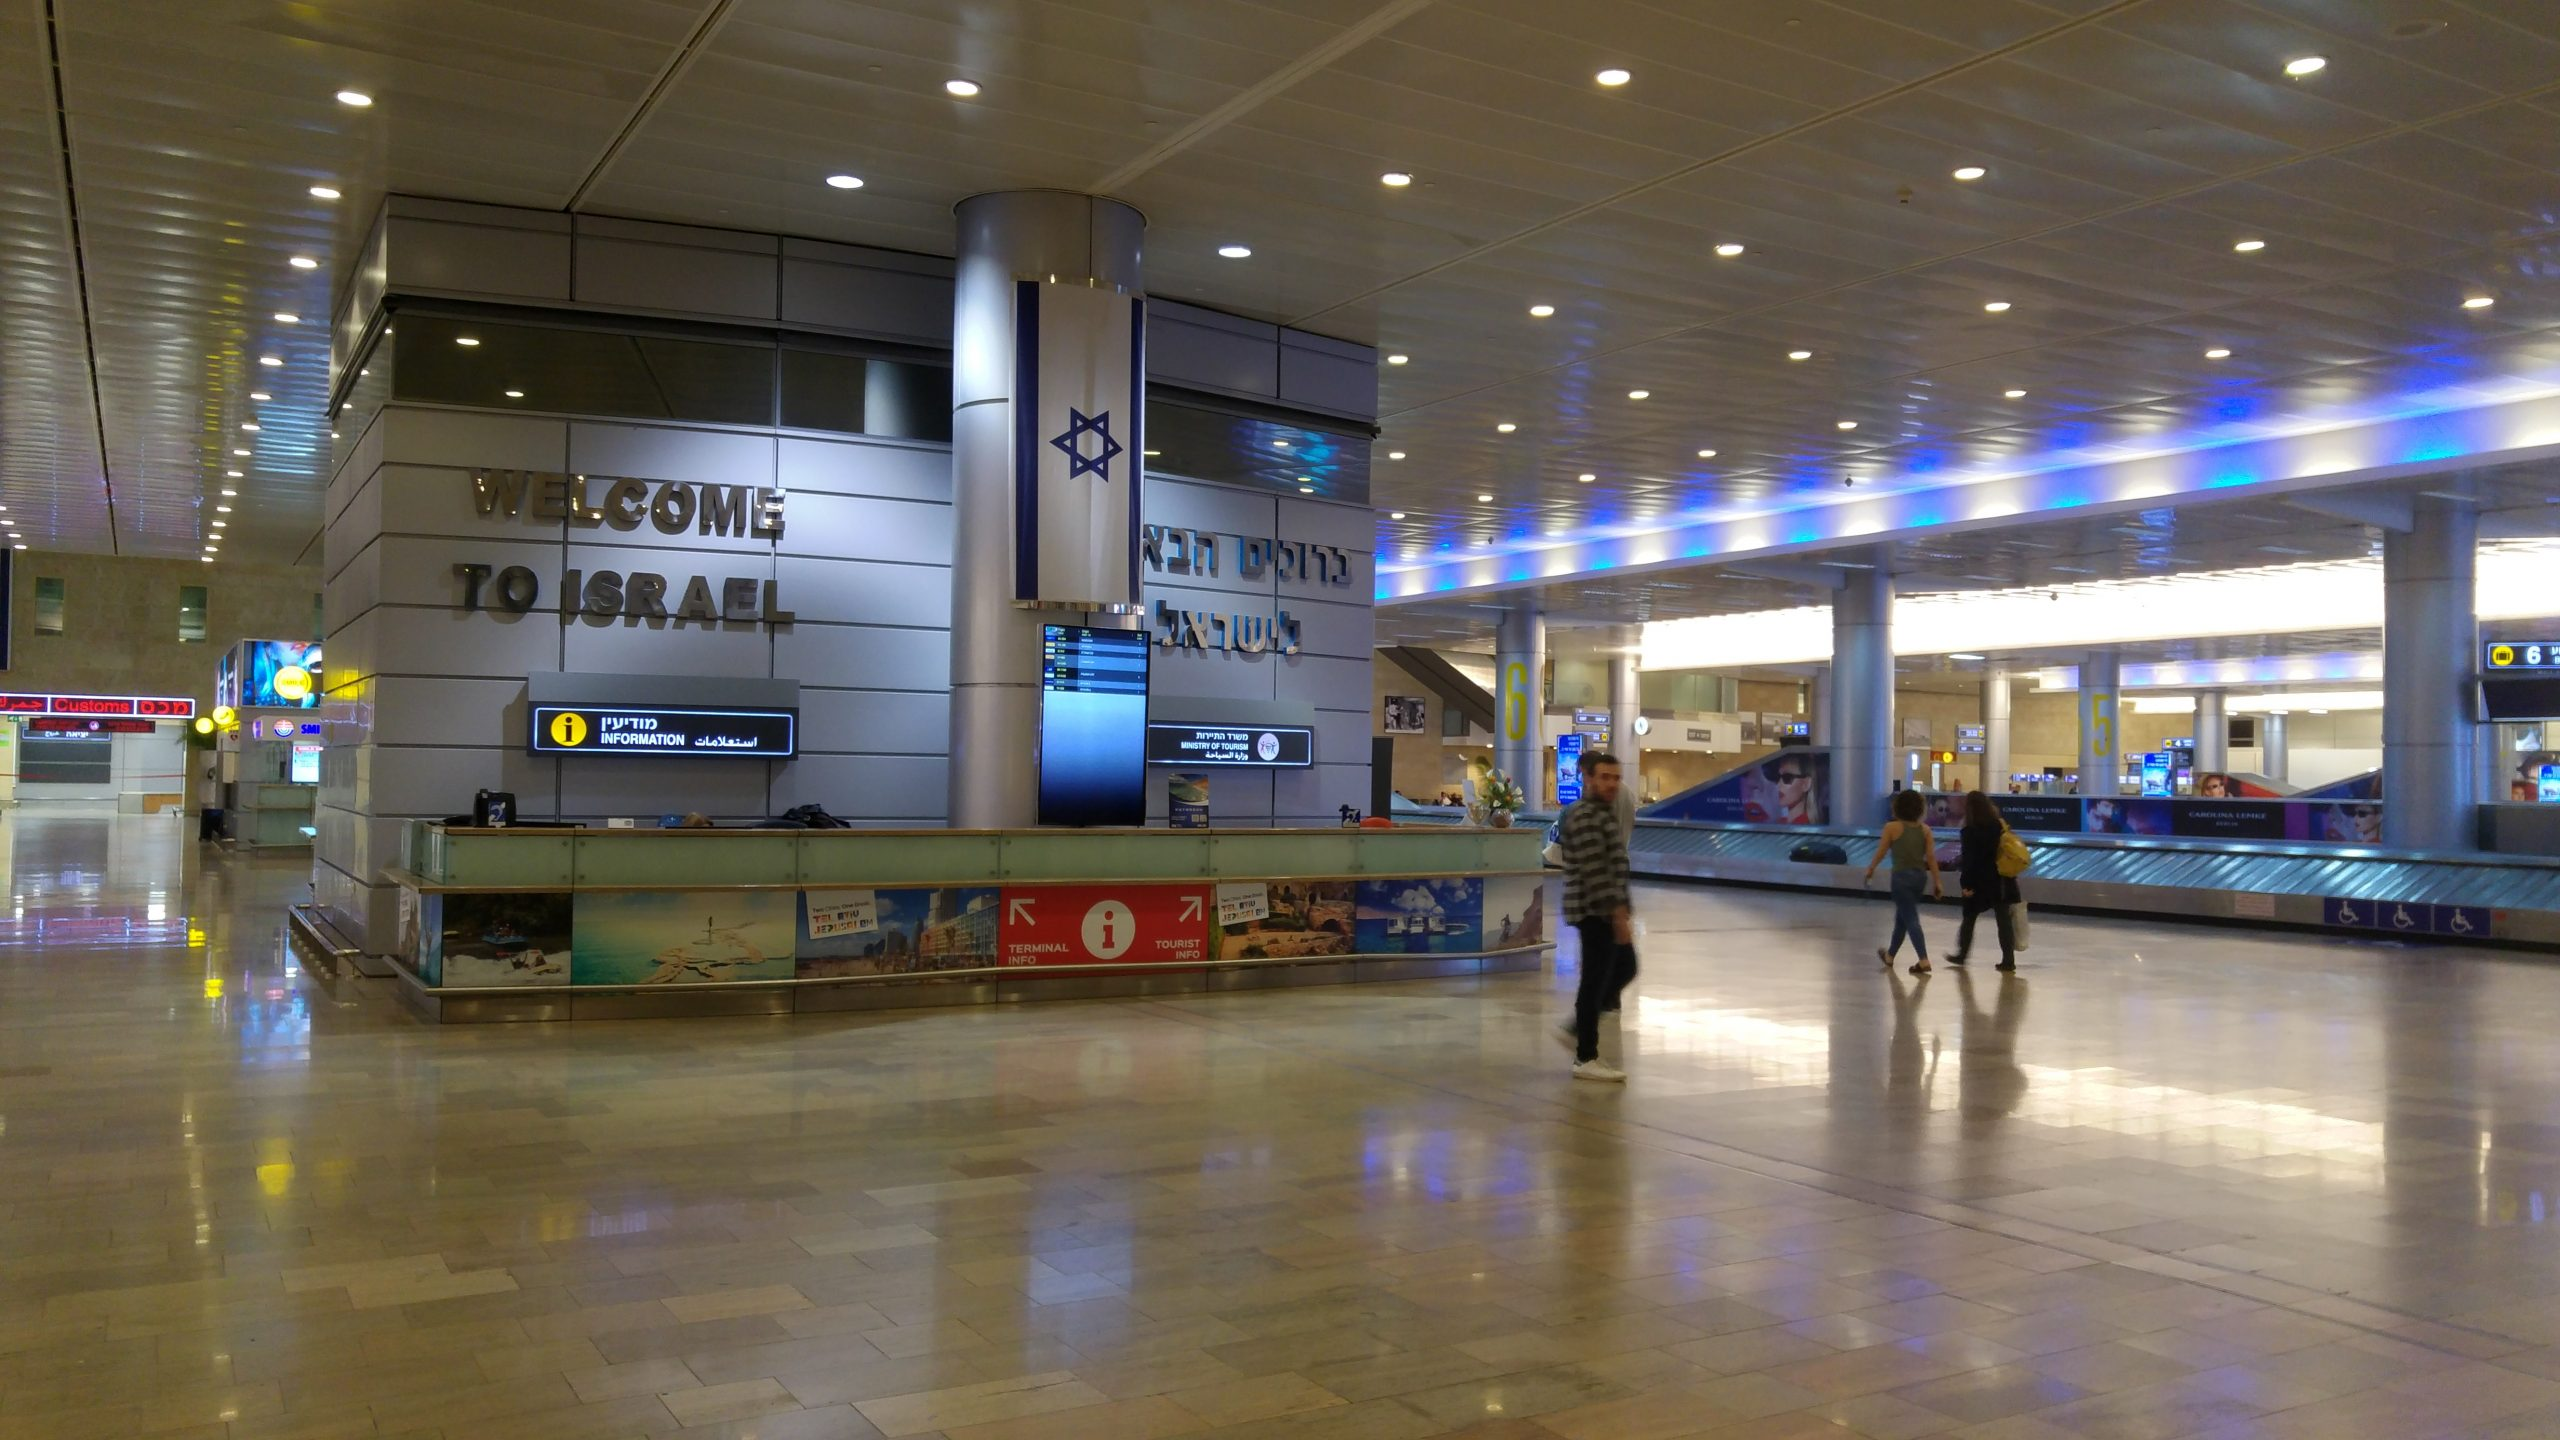 Ankomsthallen i Tel Aviv-Ben Gurion International Airport. (Foto: shutterstock_1224582493)